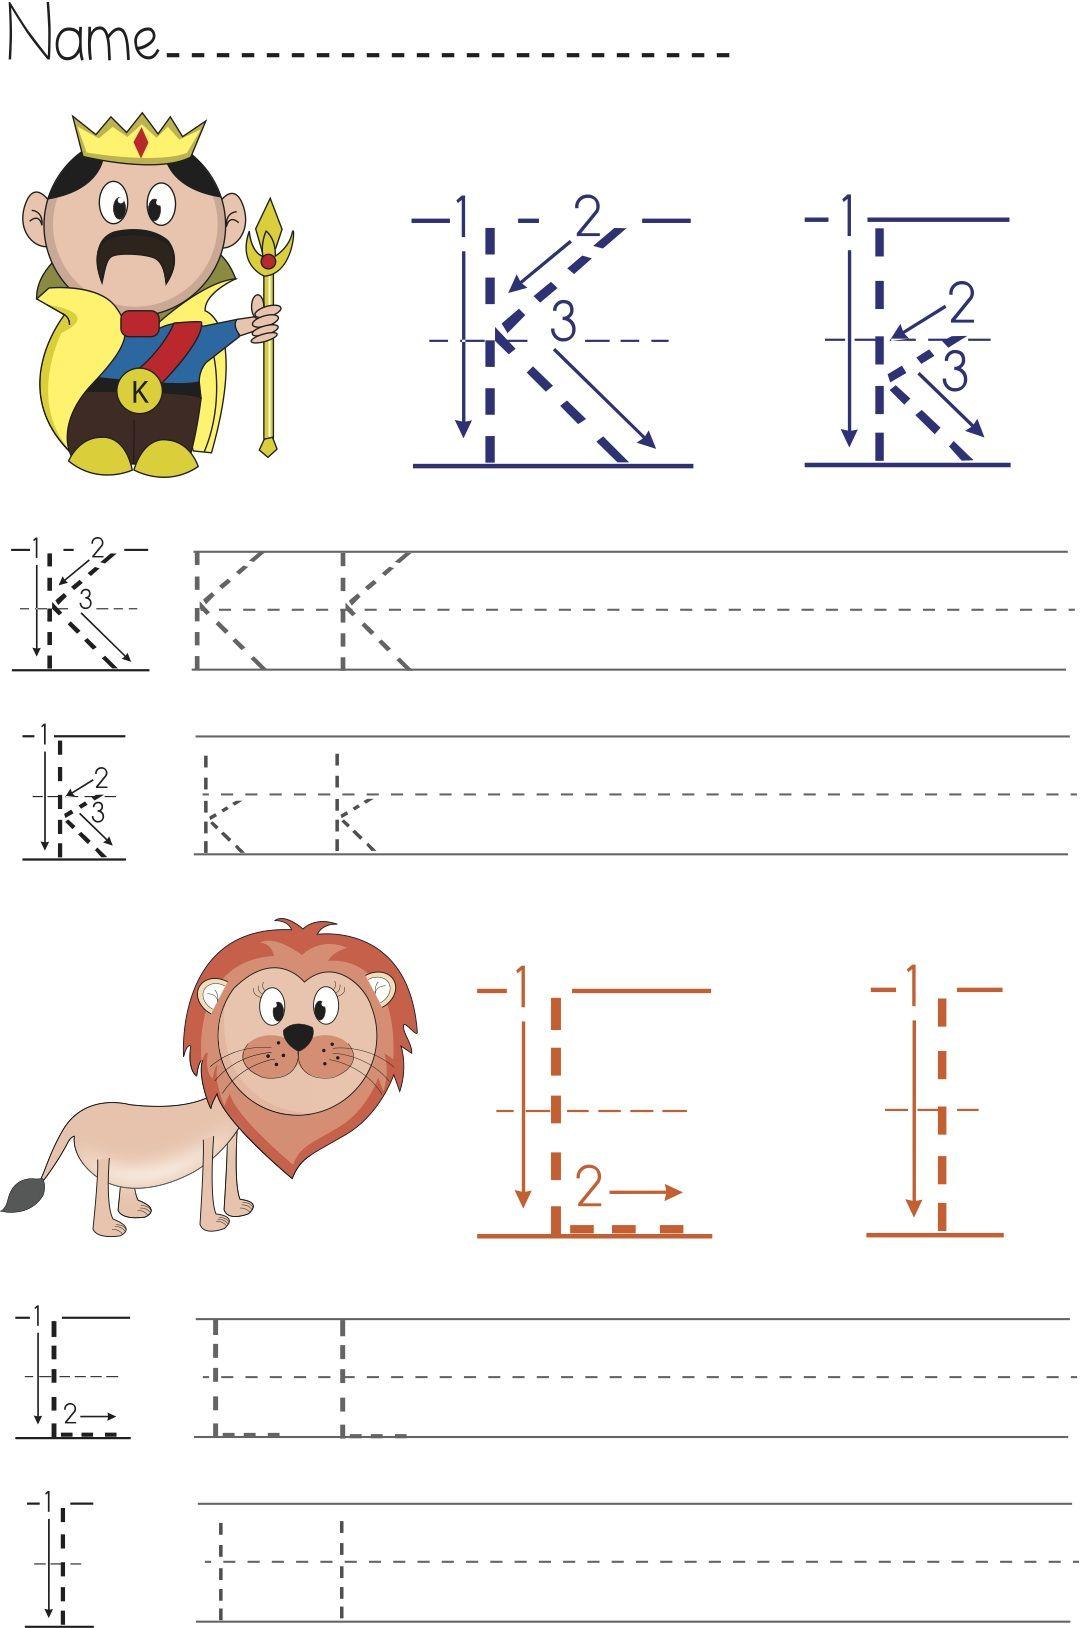 Writing Worksheet For Kids This Writing Worksheet Is A Fun